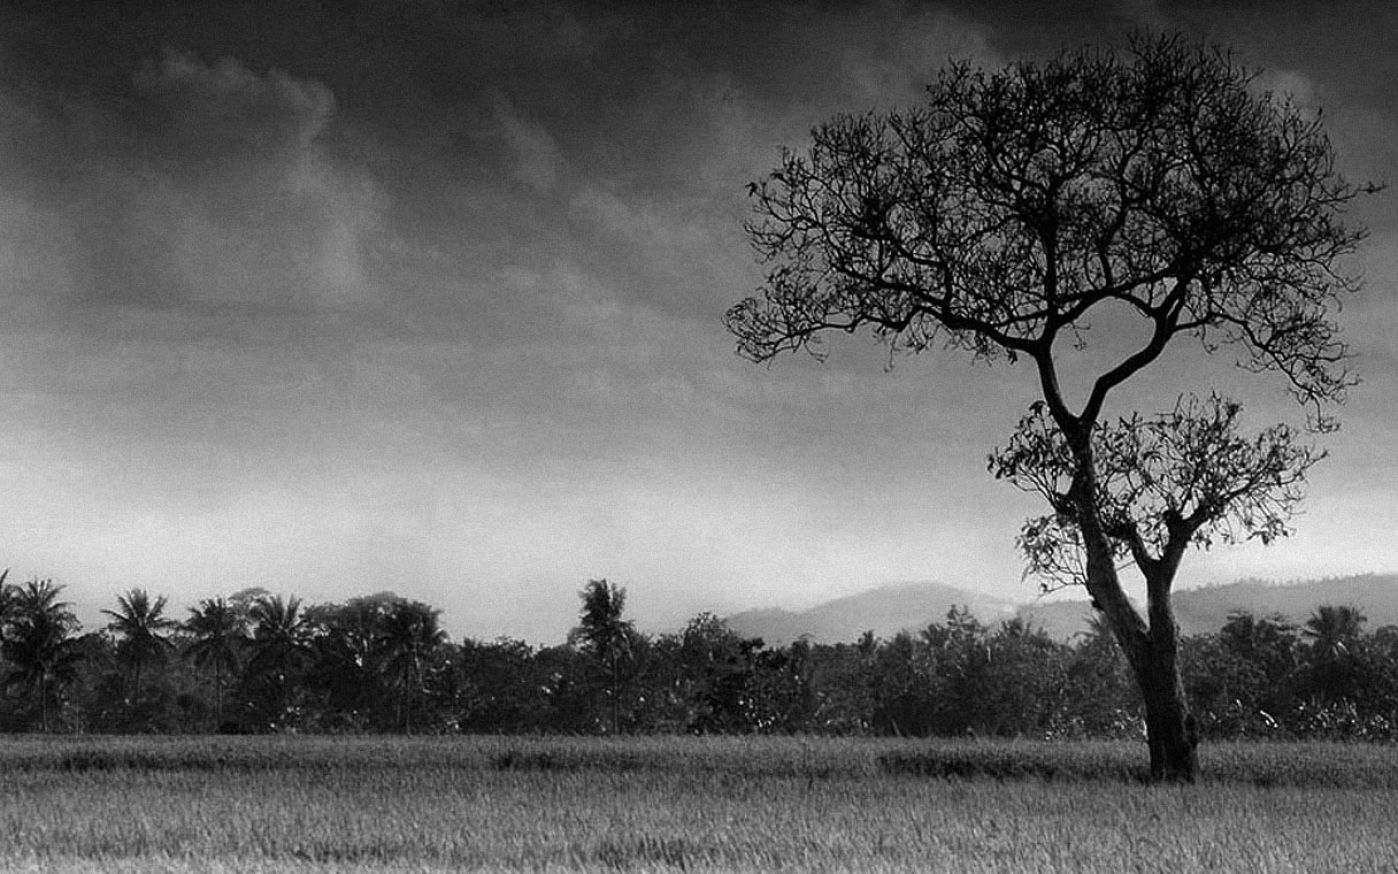 Black And White Desktop Backgrounds - WallpaperSafari